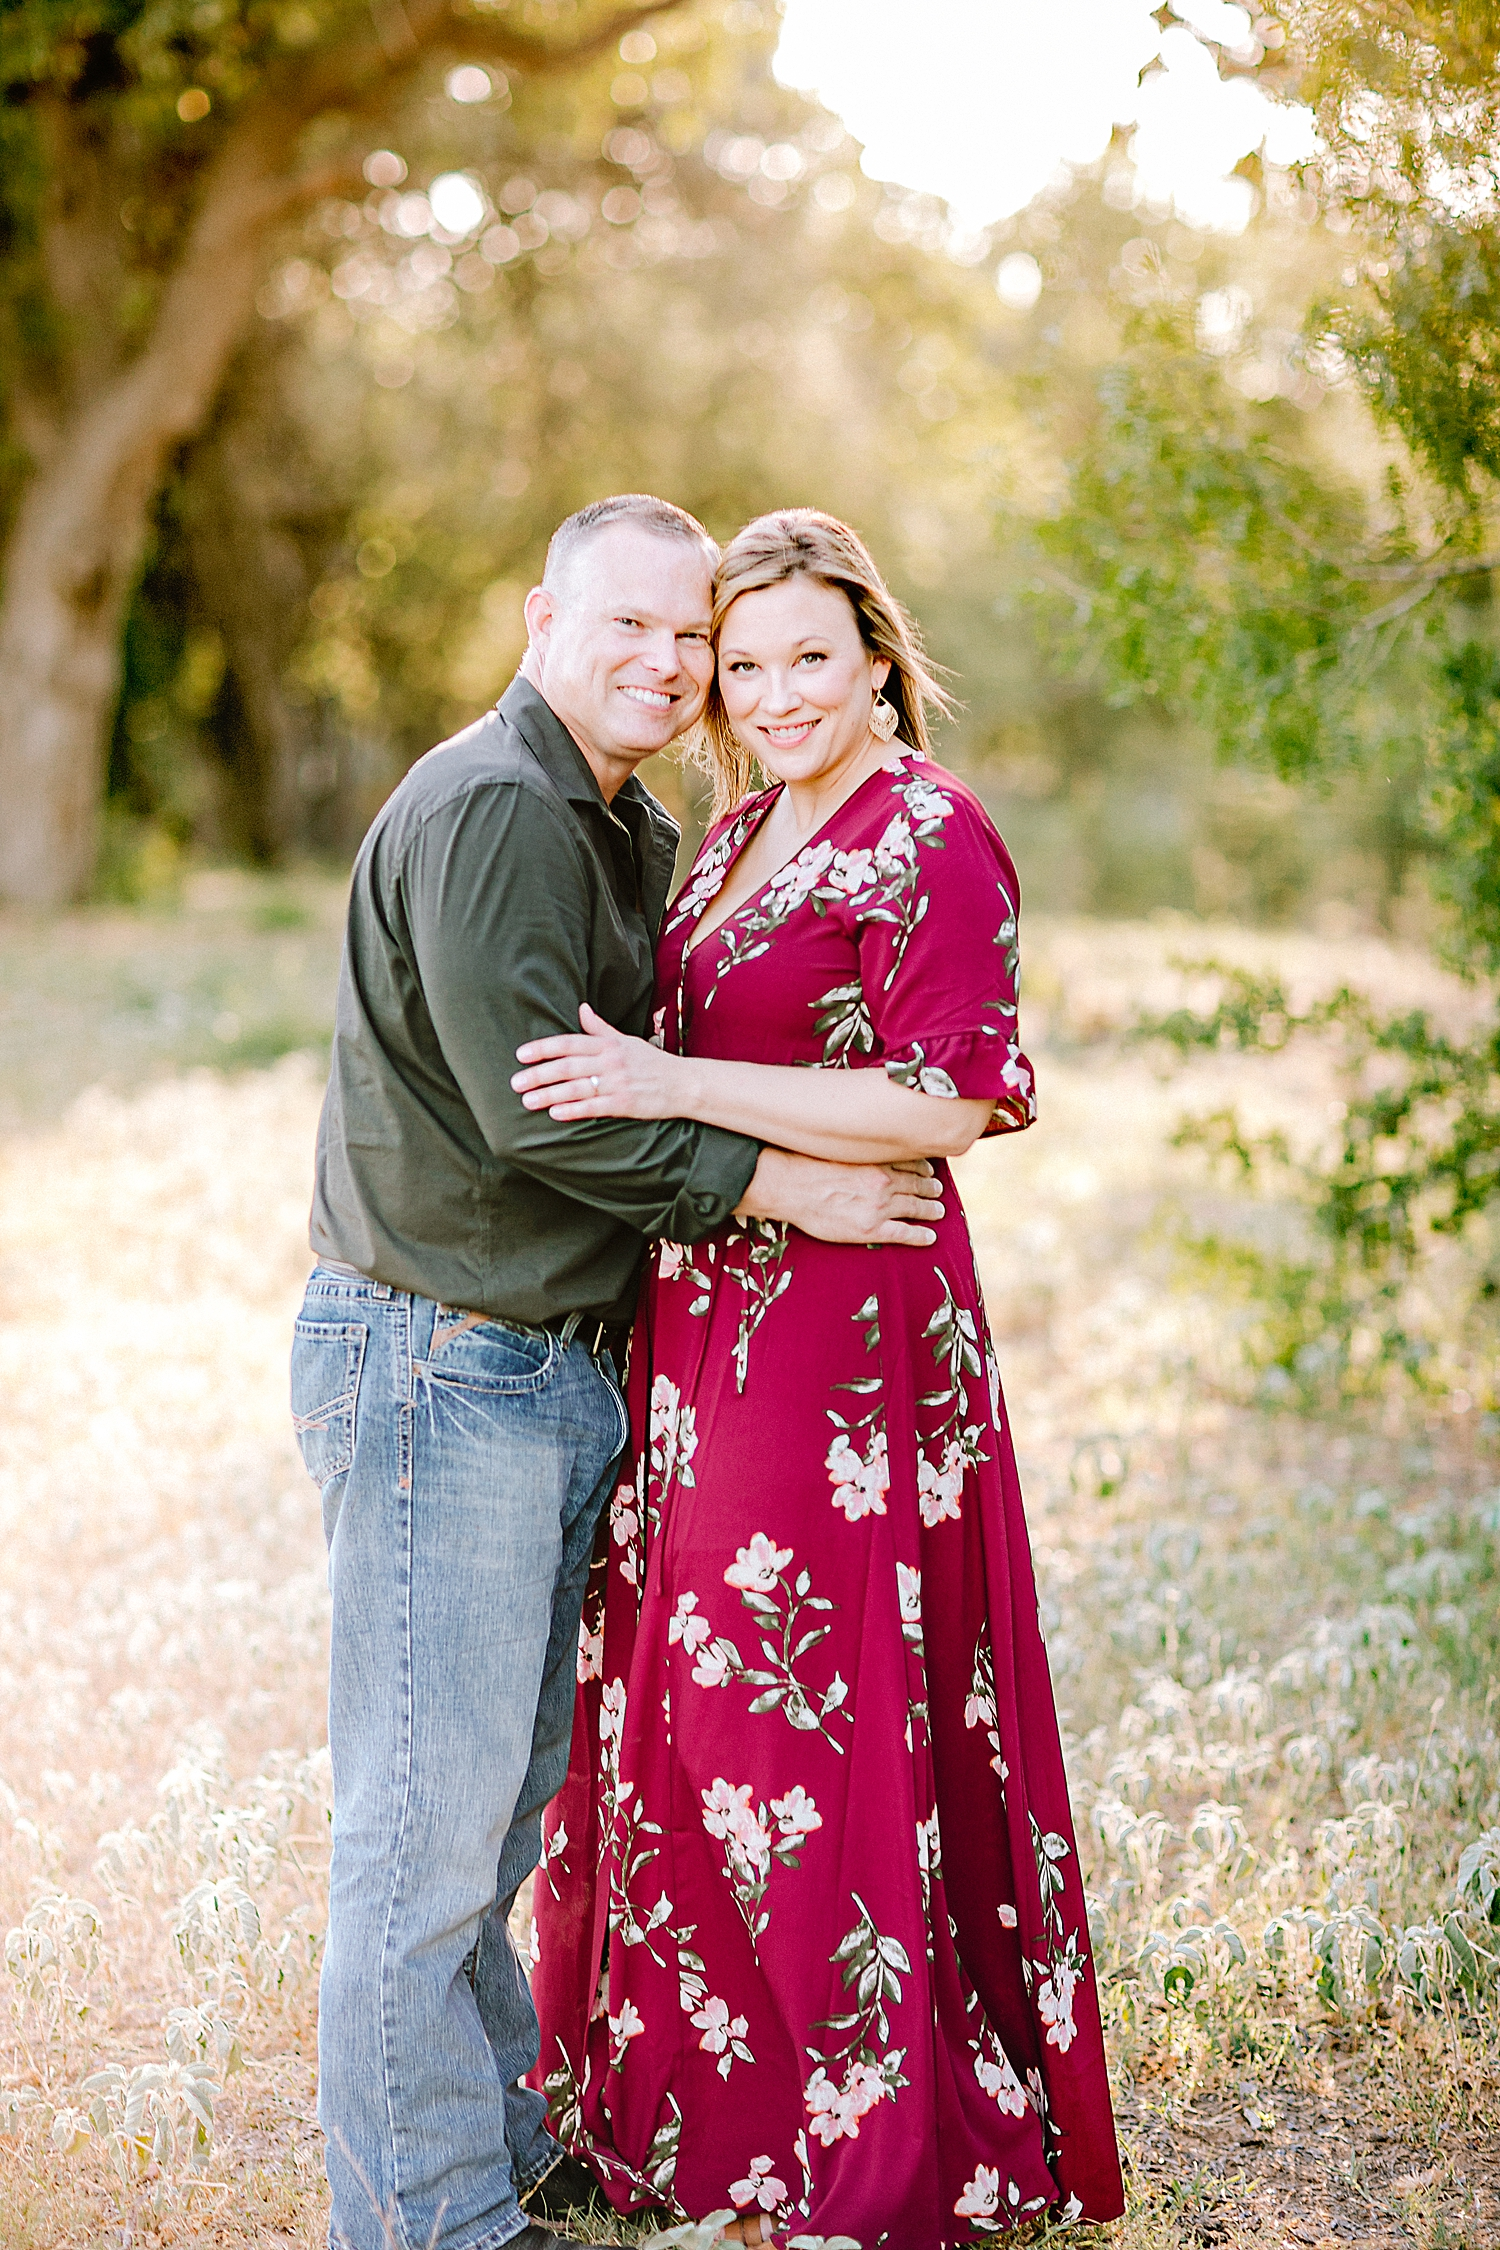 Carly-Barton-Photography-La-Vernia-Texas-Engagement-Photos-Sunset_0001.jpg